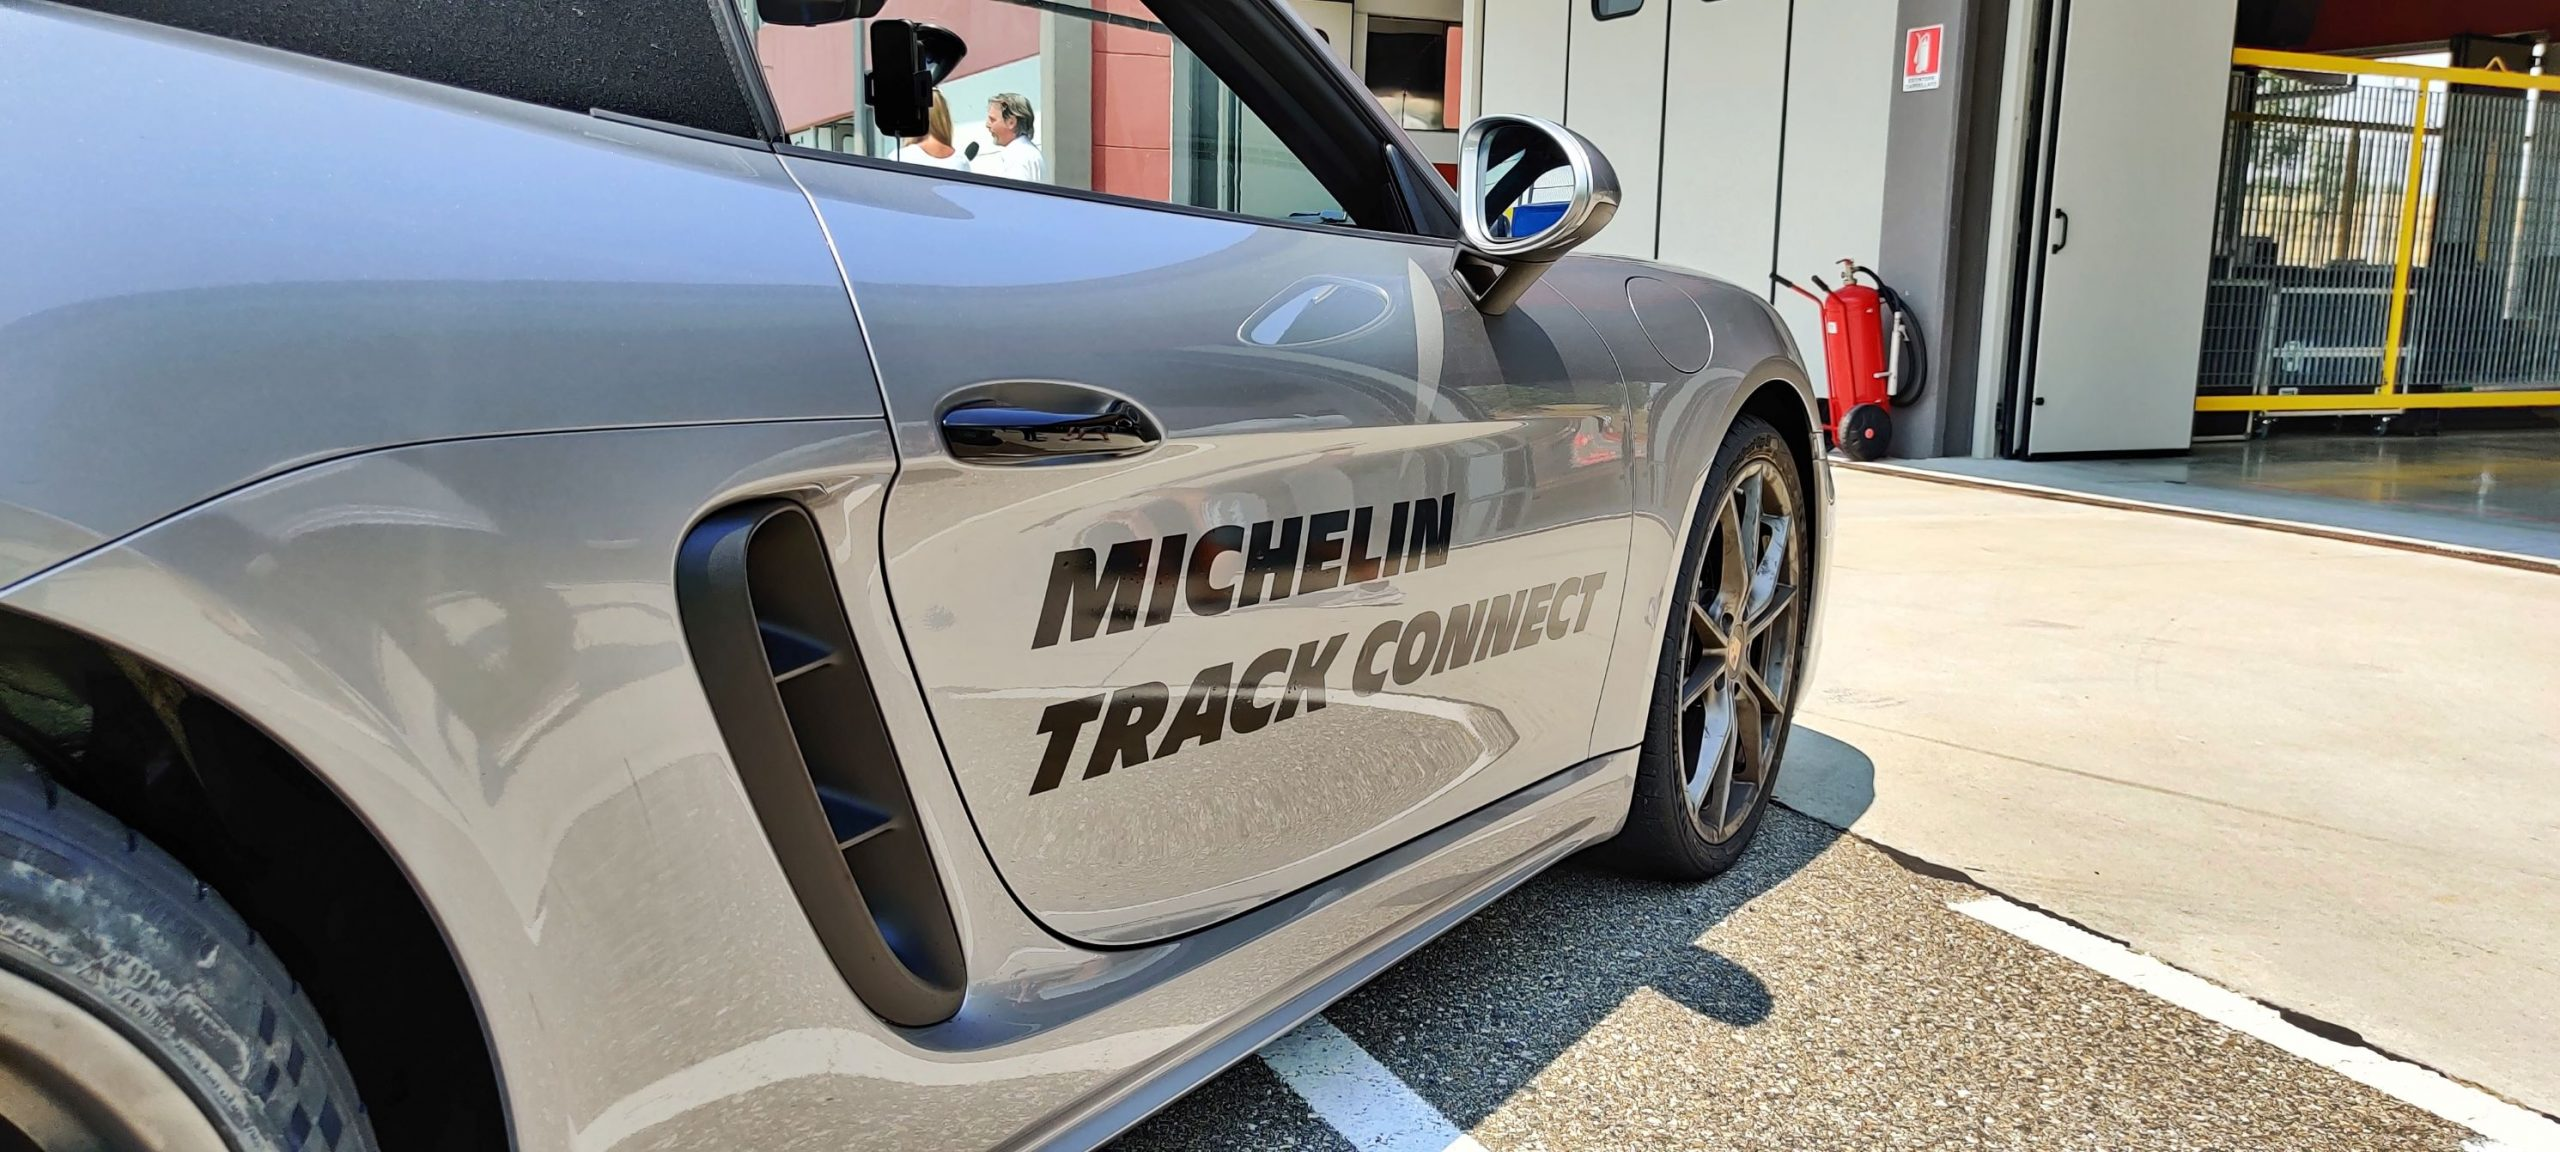 MICHELIN-Pilot Sport Cup 2 CONNECT track connect su 718